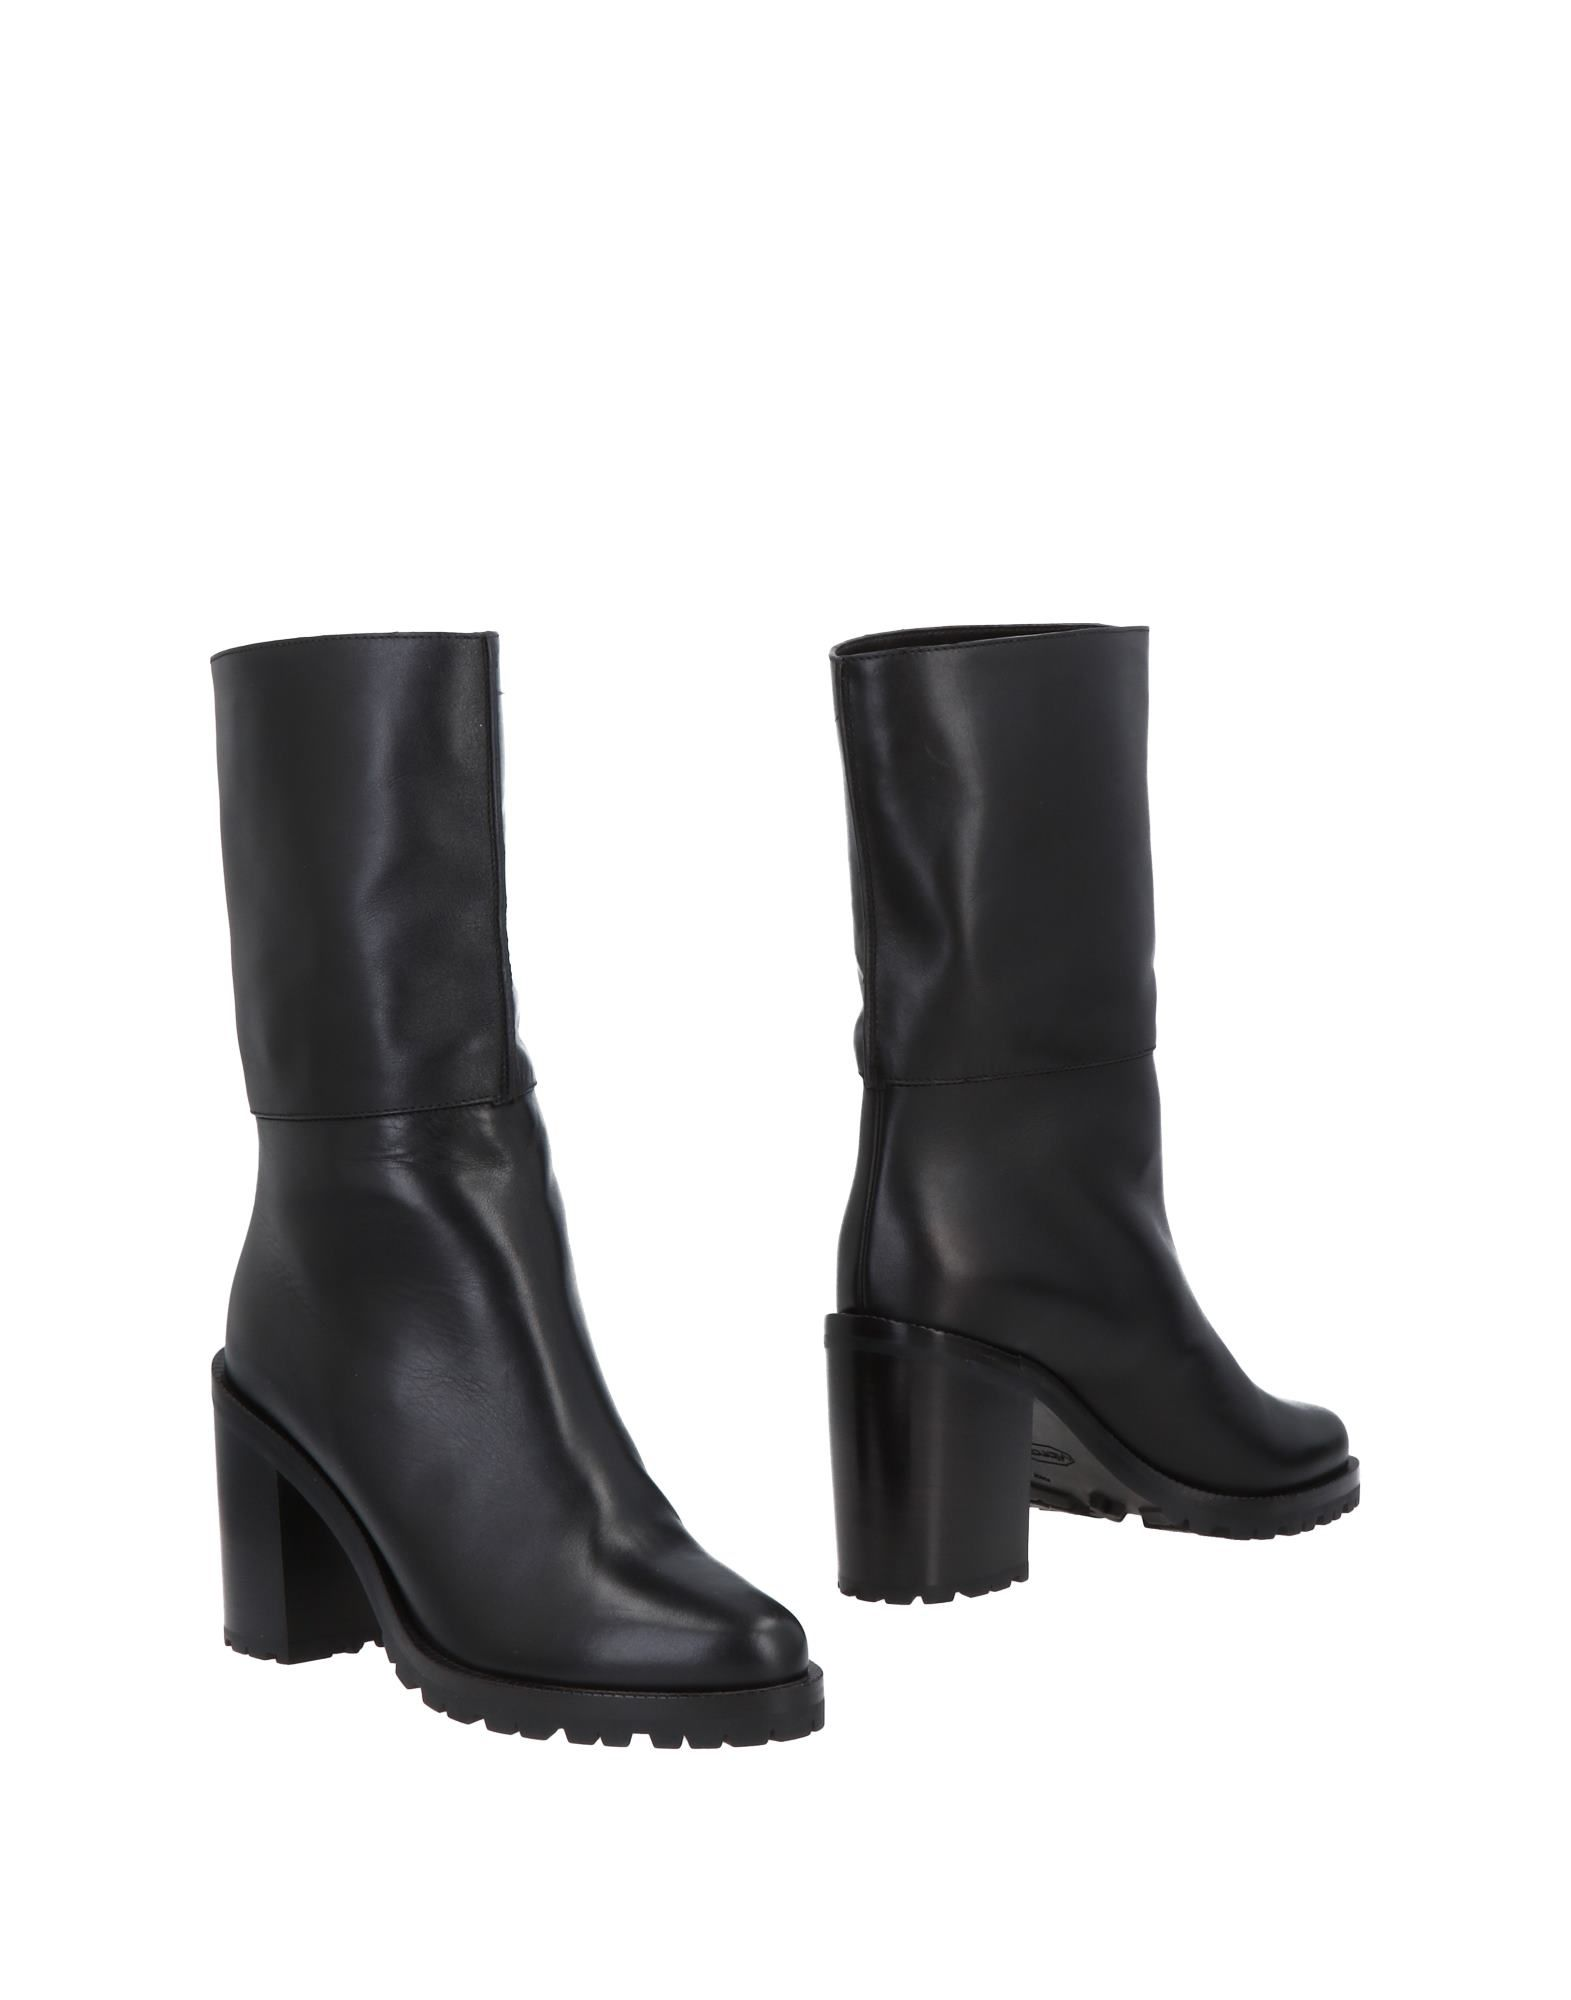 WALTER STEIGER Полусапоги и высокие ботинки цены онлайн